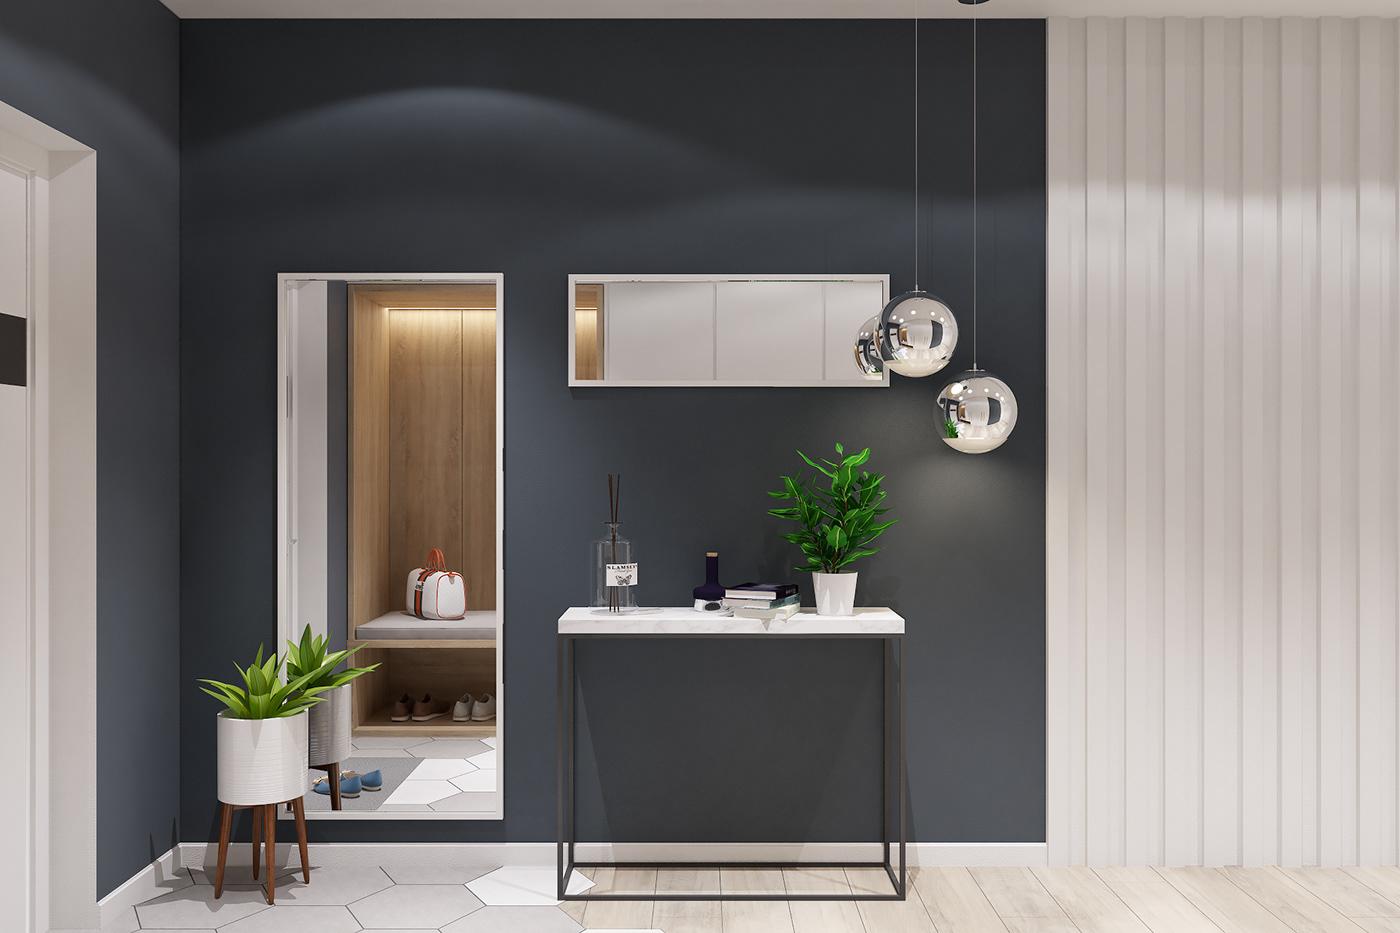 Image may contain: sink, wall and interior